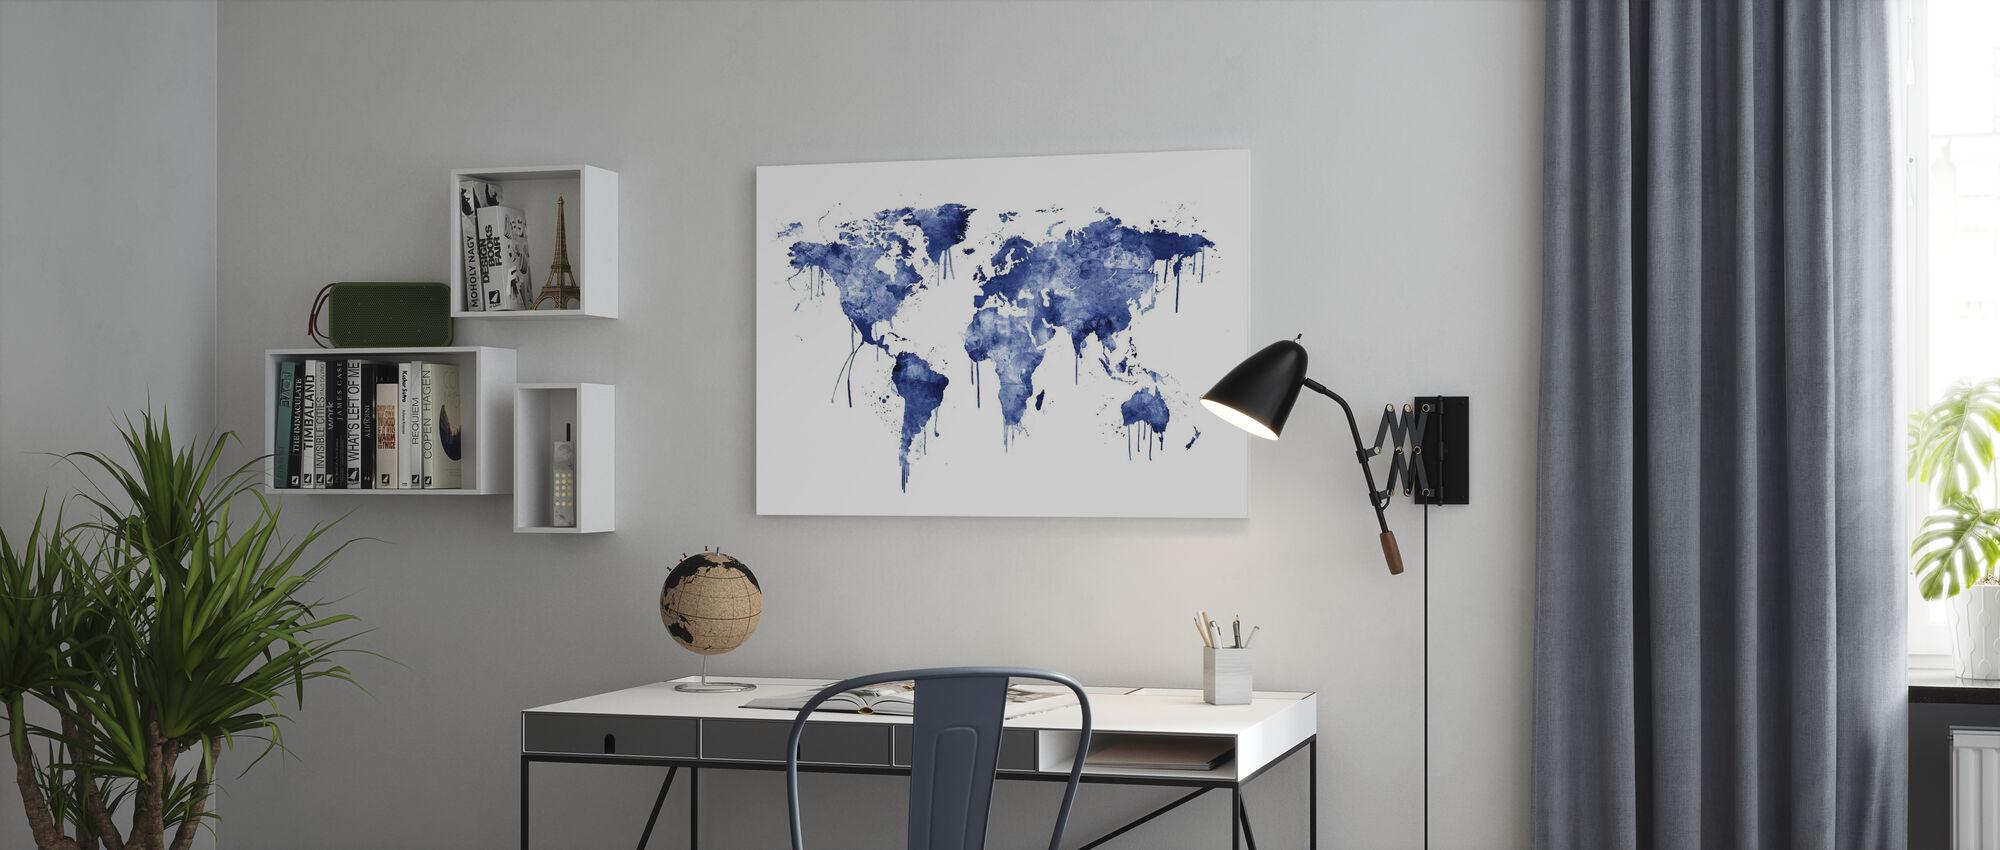 Aquarell Weltkarte Blau - Leinwandbild - Büro